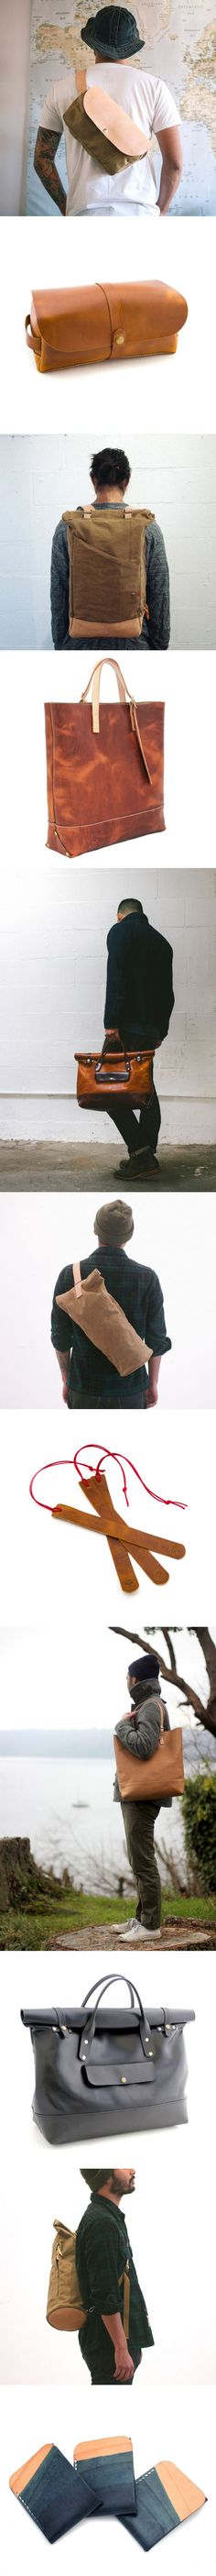 Teranishi Handmade Leather Goods / IAMTHELAB.com